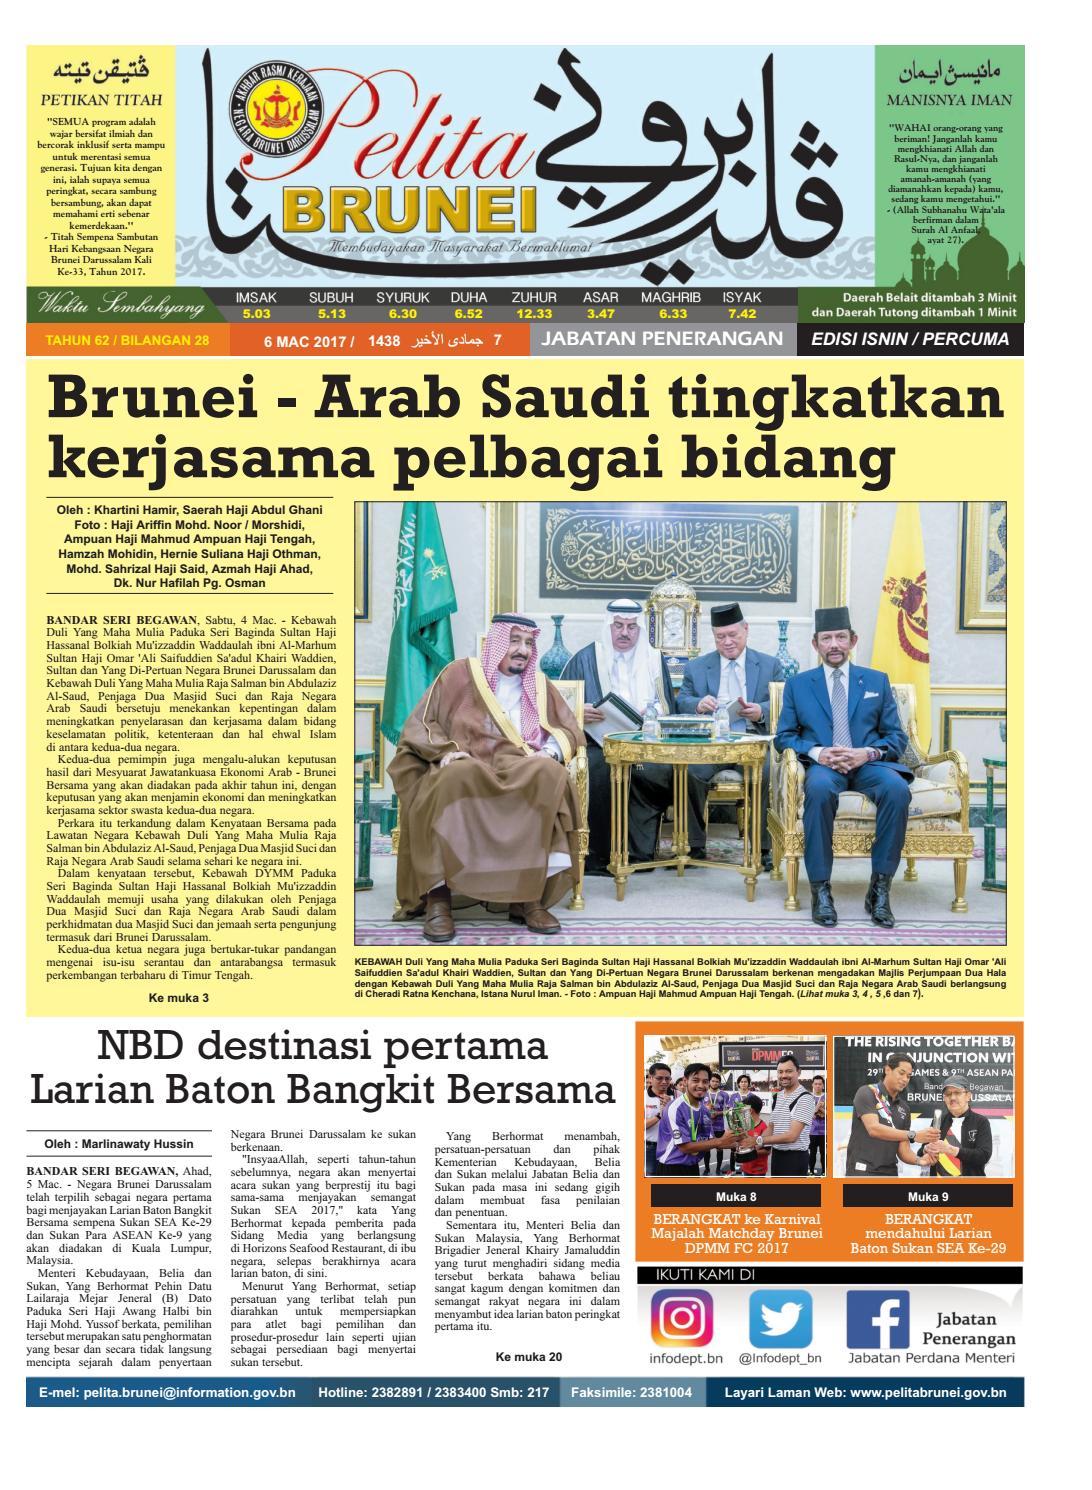 Pelita Brunei Isnin 06 Mac 2017 By Putera Katak Brunei Issuu